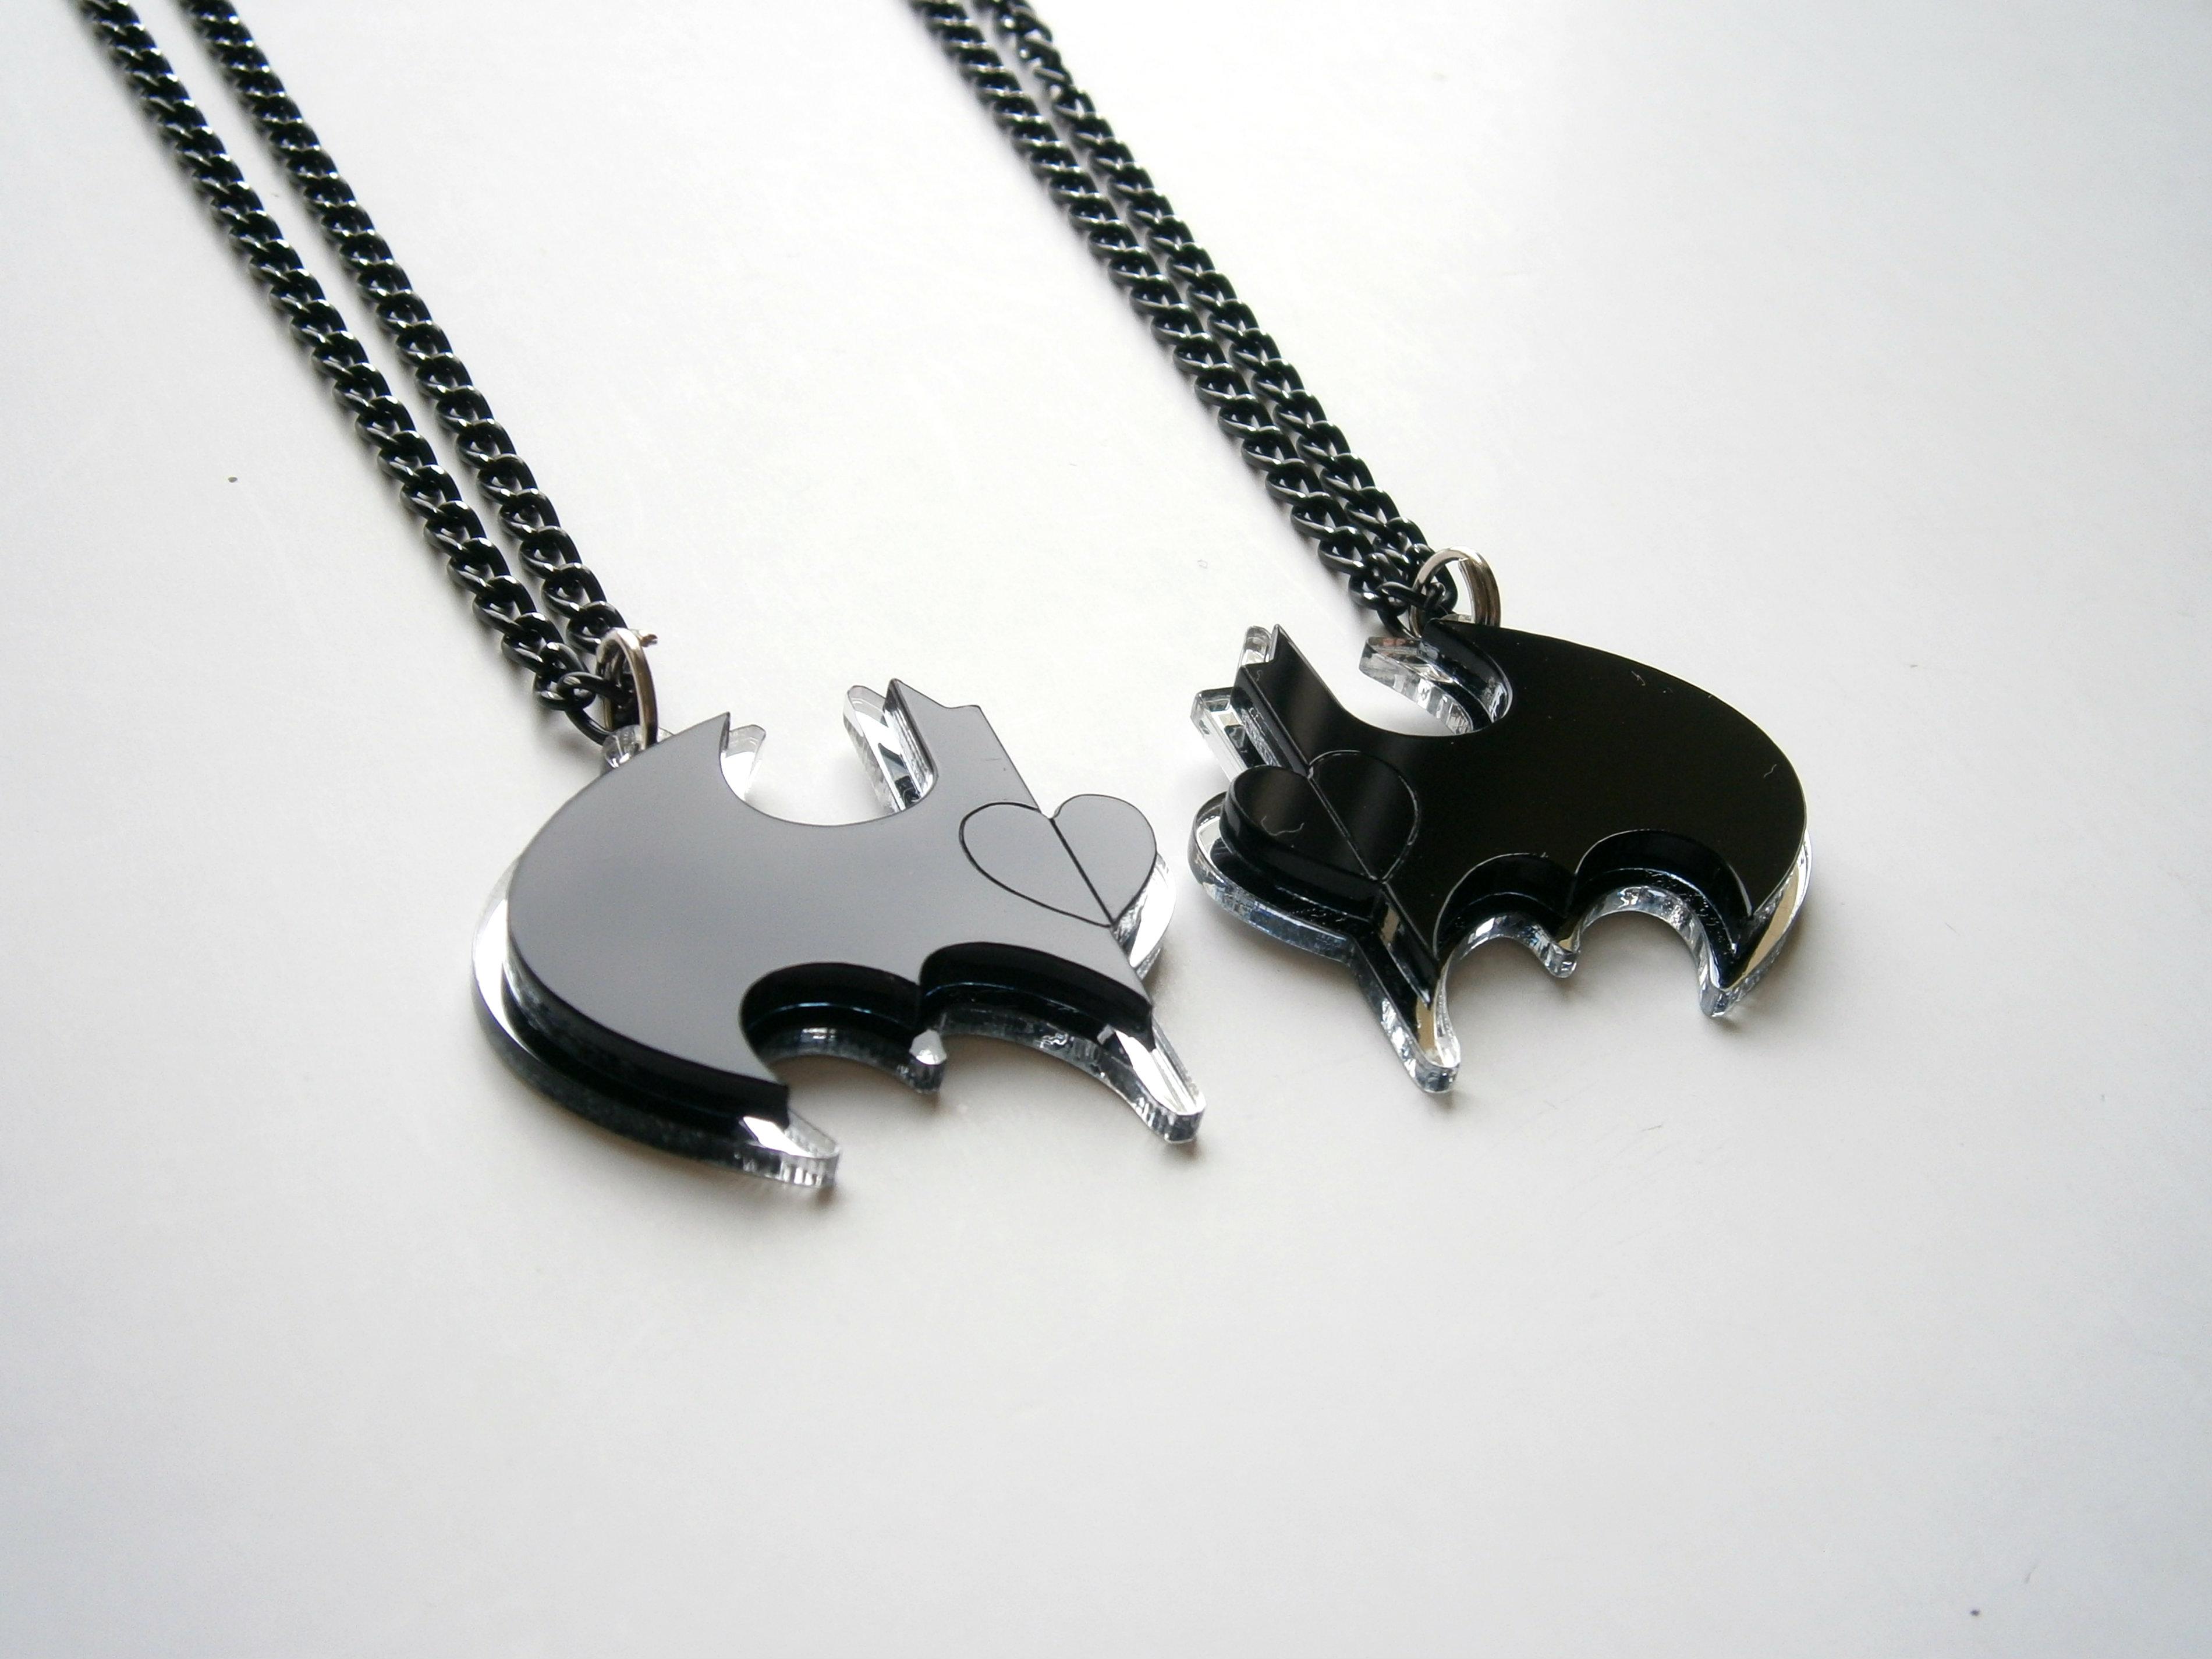 batman friendship necklaces inspiring jewelry sale